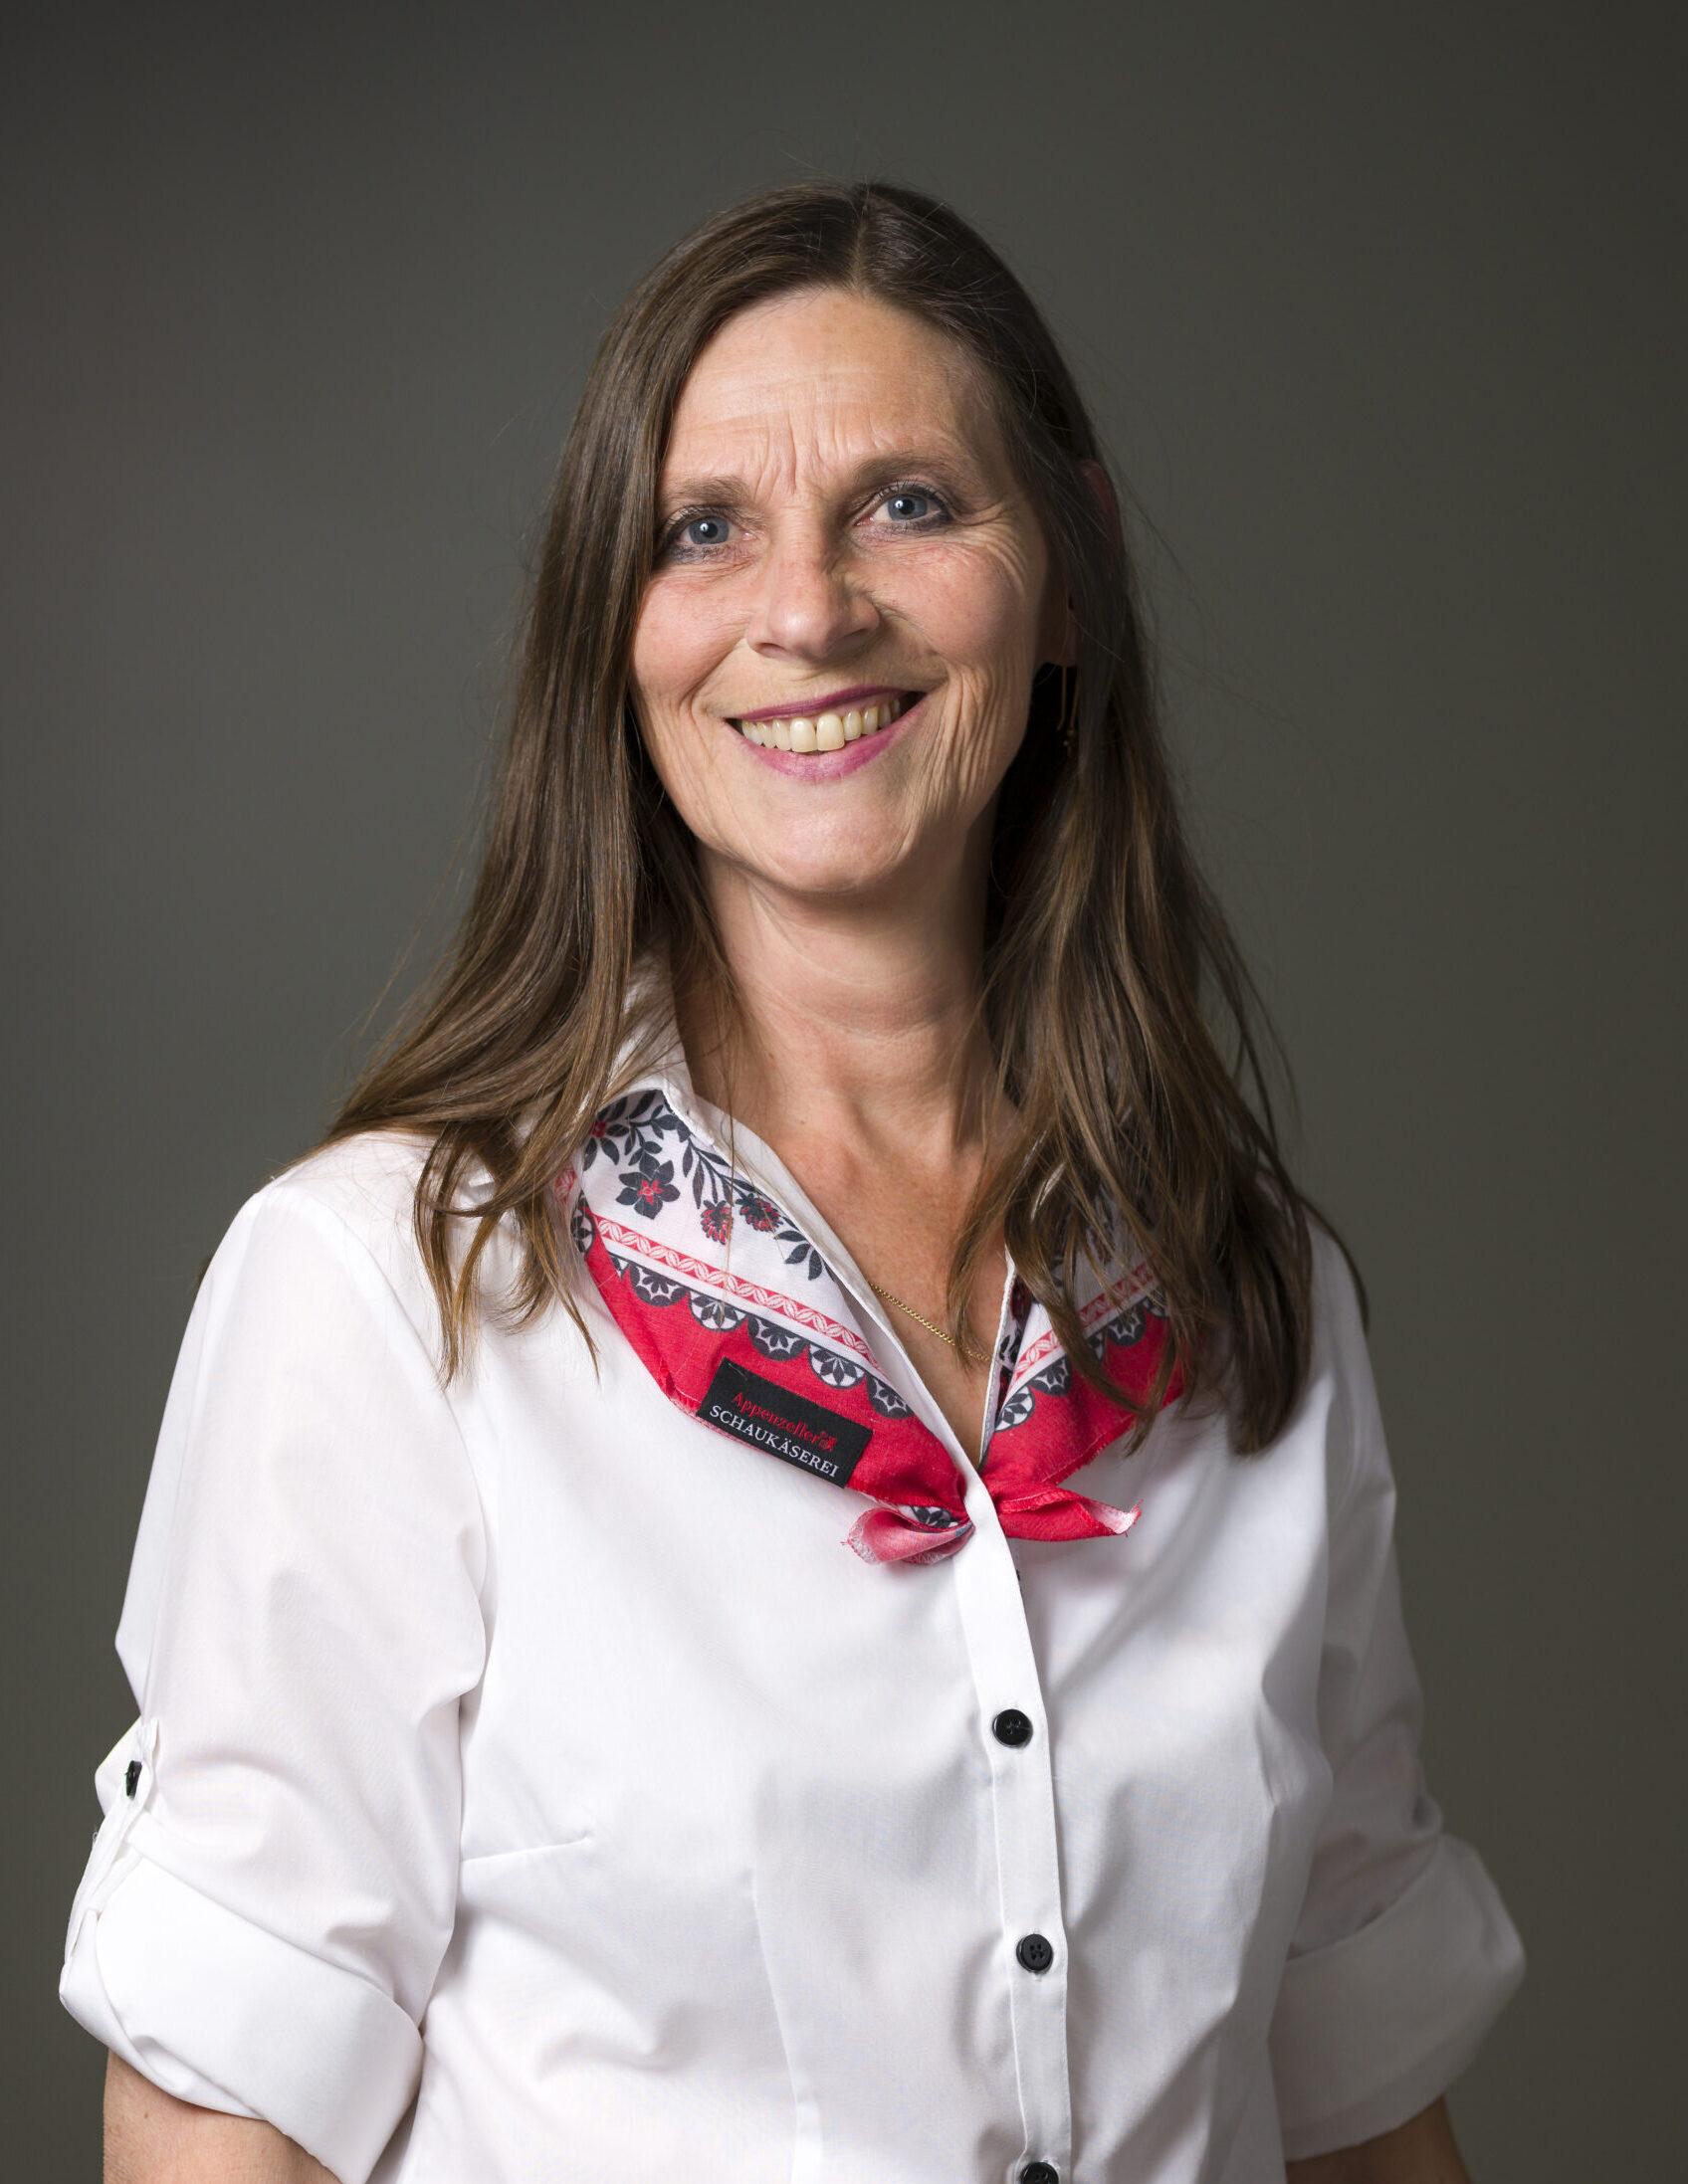 Susanne Ehrler, Gastgeberin